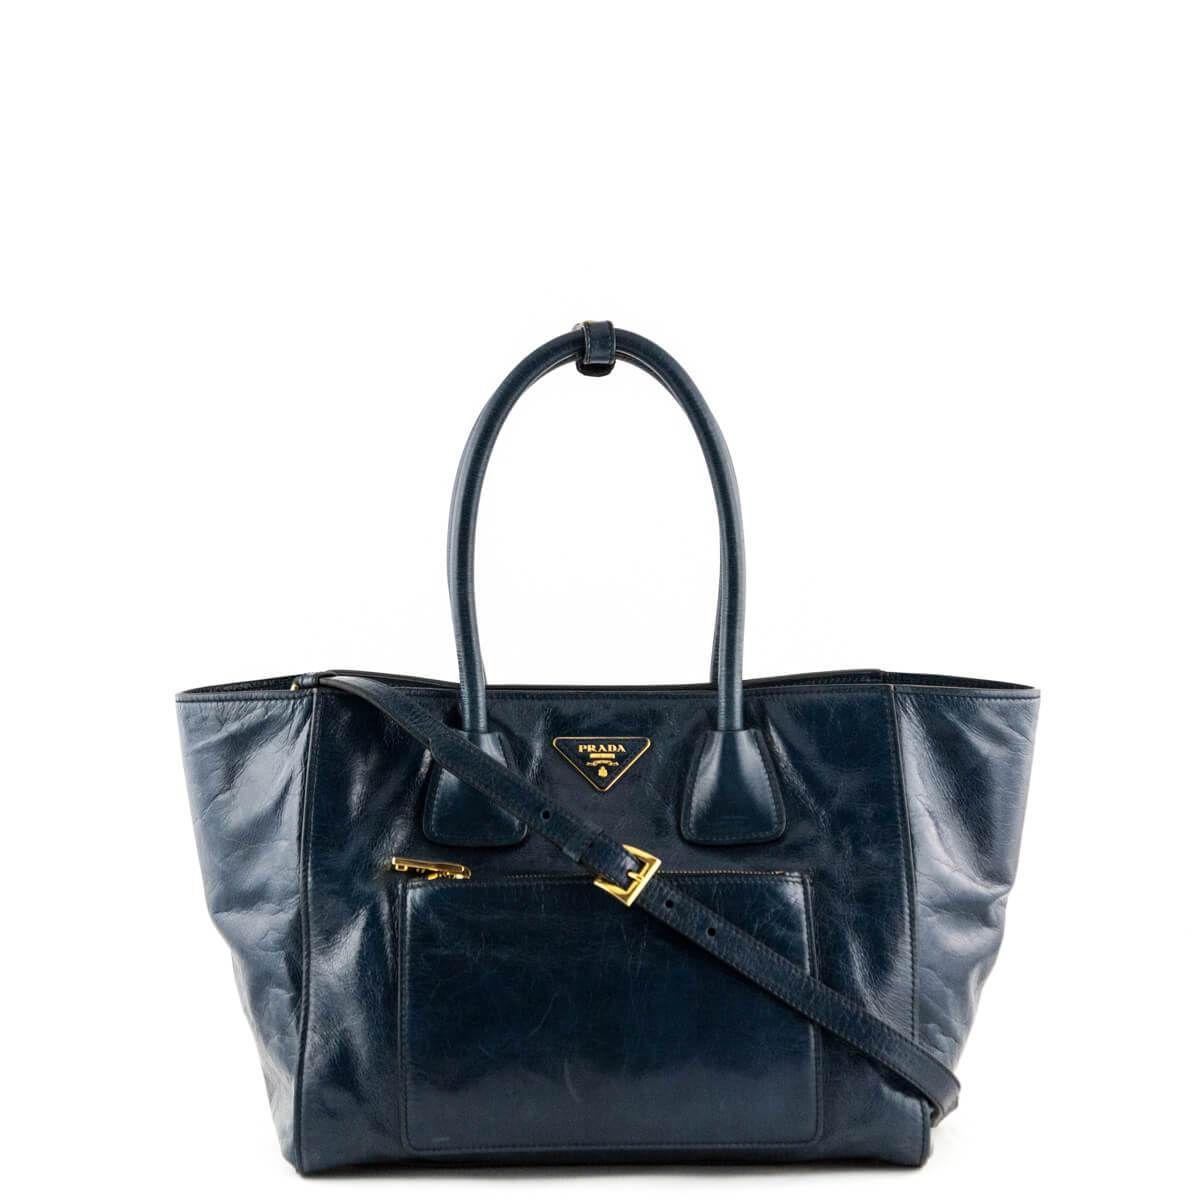 Prada Denim Blue Vitello Shine Phenix Leather Shopping Tote - LOVE that BAG  - Preowned Authentic 339f8a555d76b